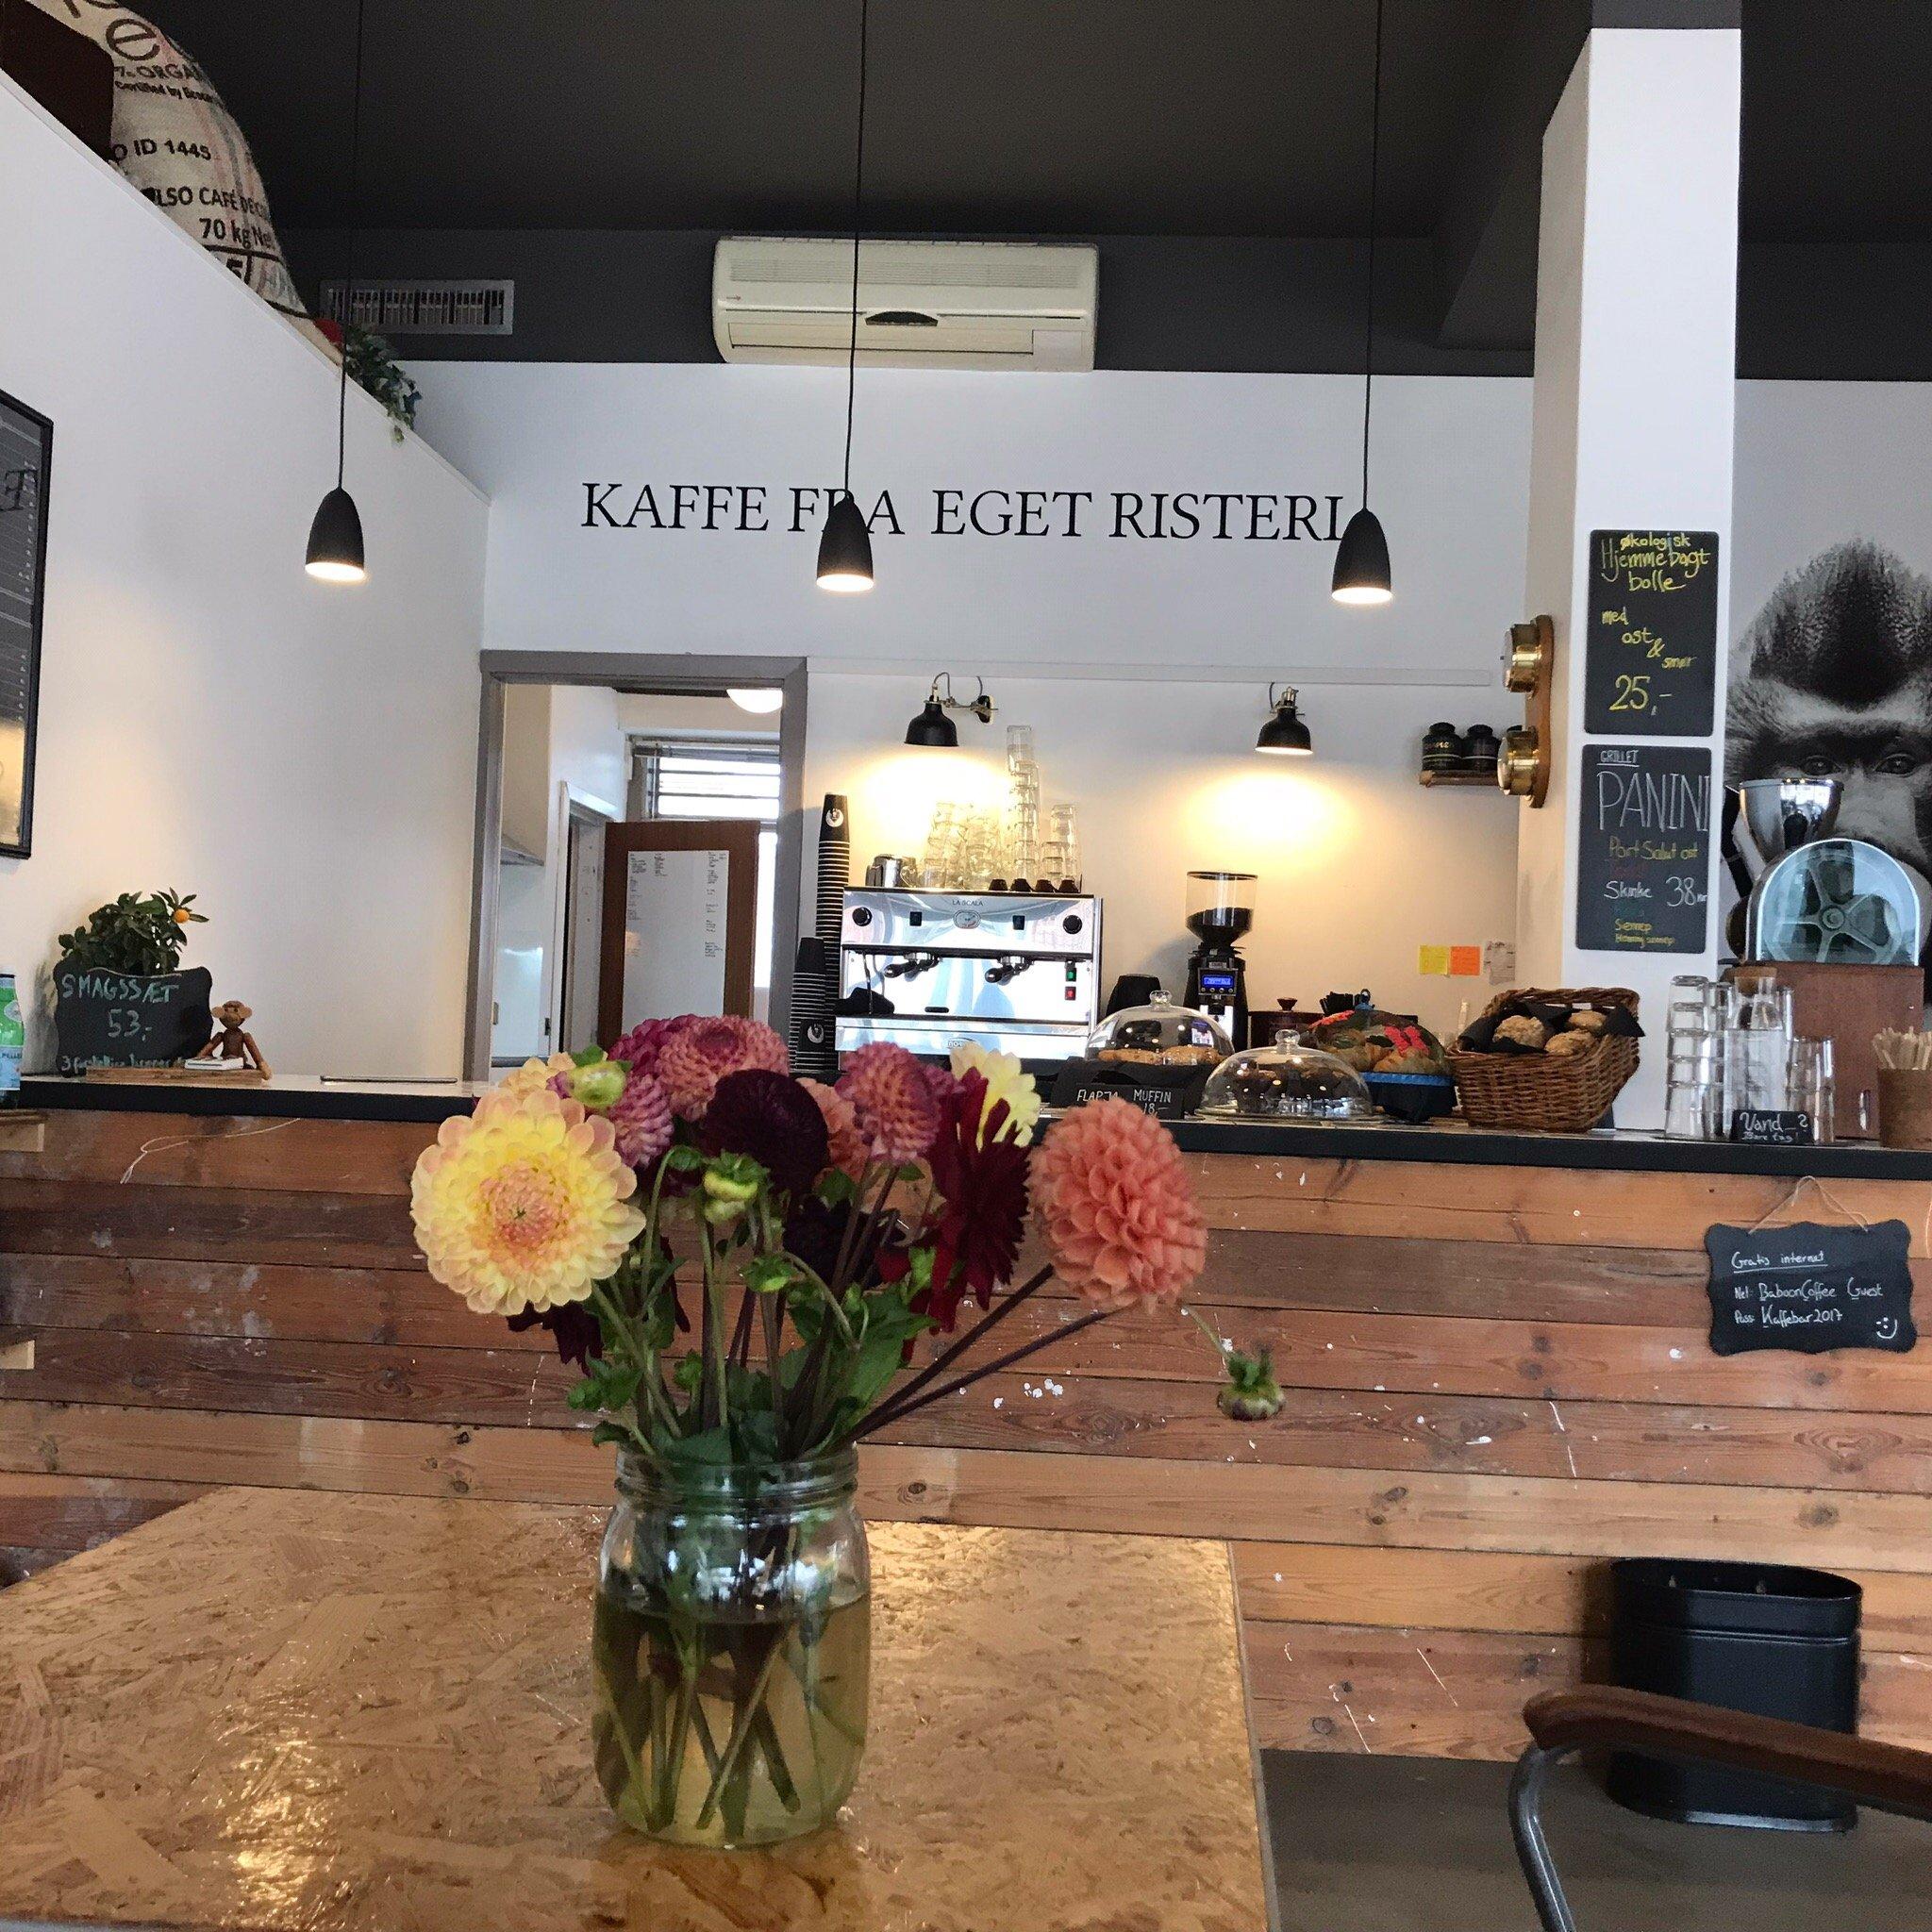 kaffebar online dating